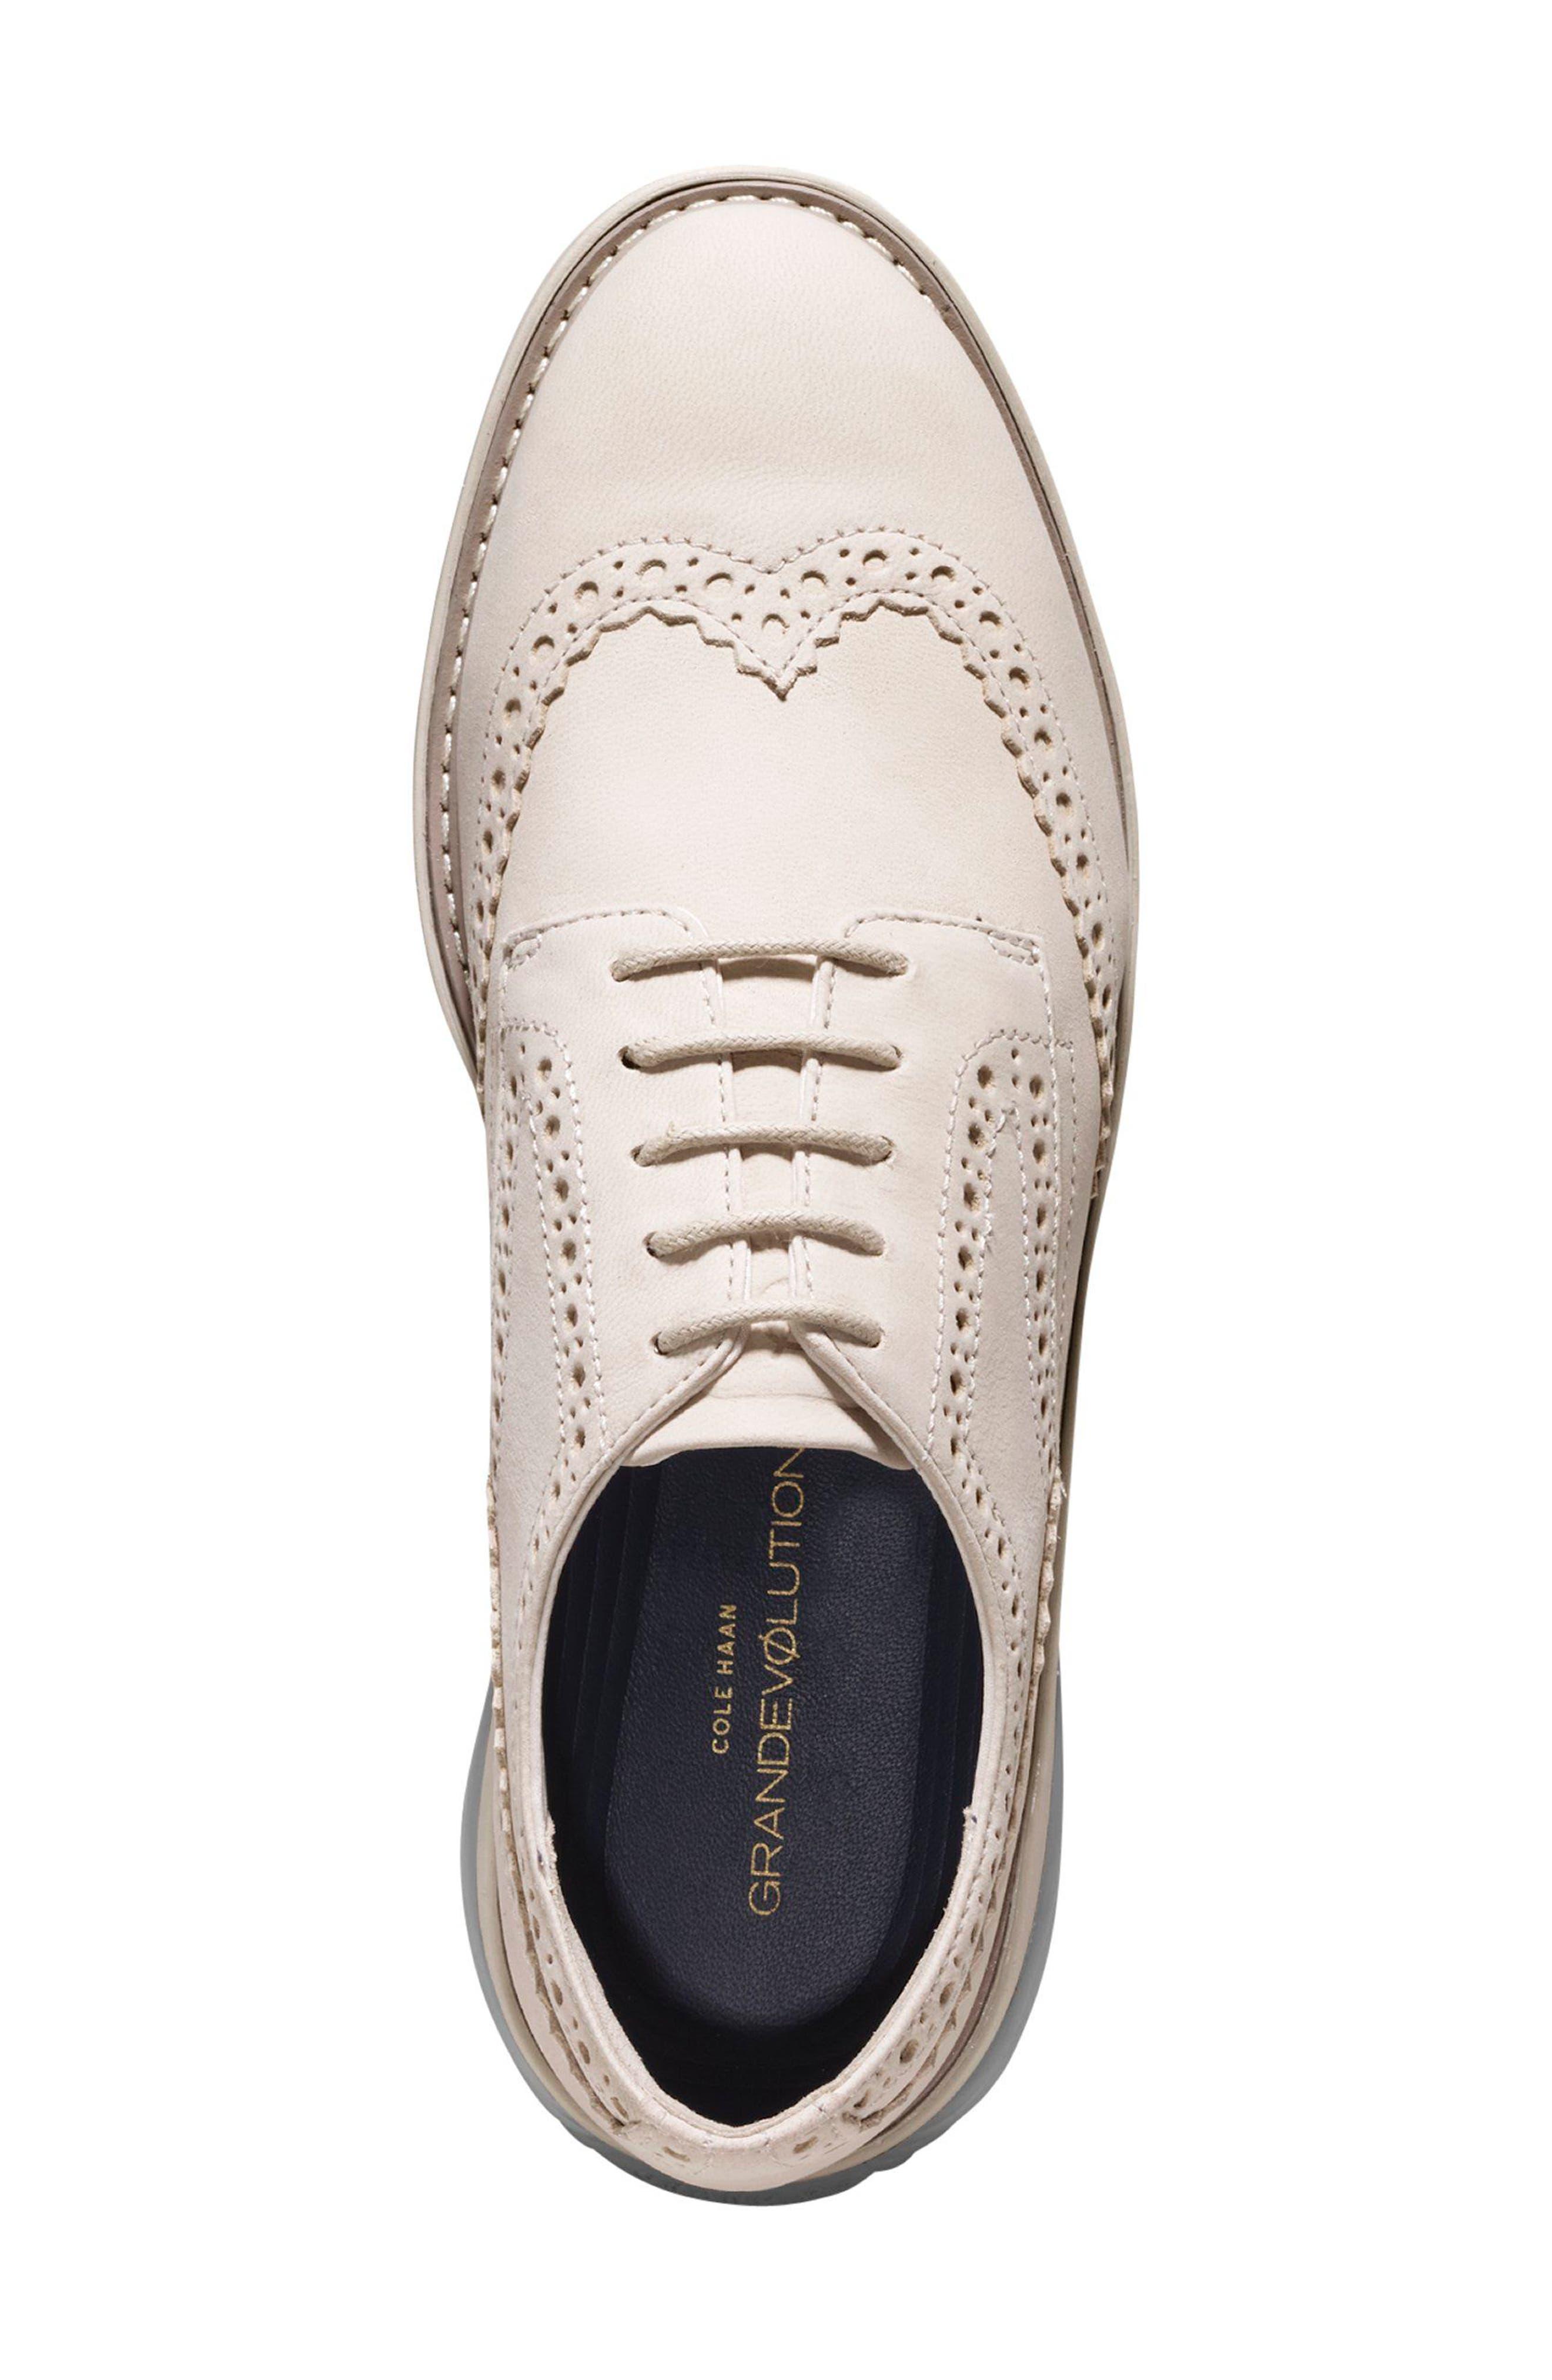 Grandevolution Shortwing Oxford Sneaker,                             Alternate thumbnail 4, color,                             Pumice Stone Nubuck